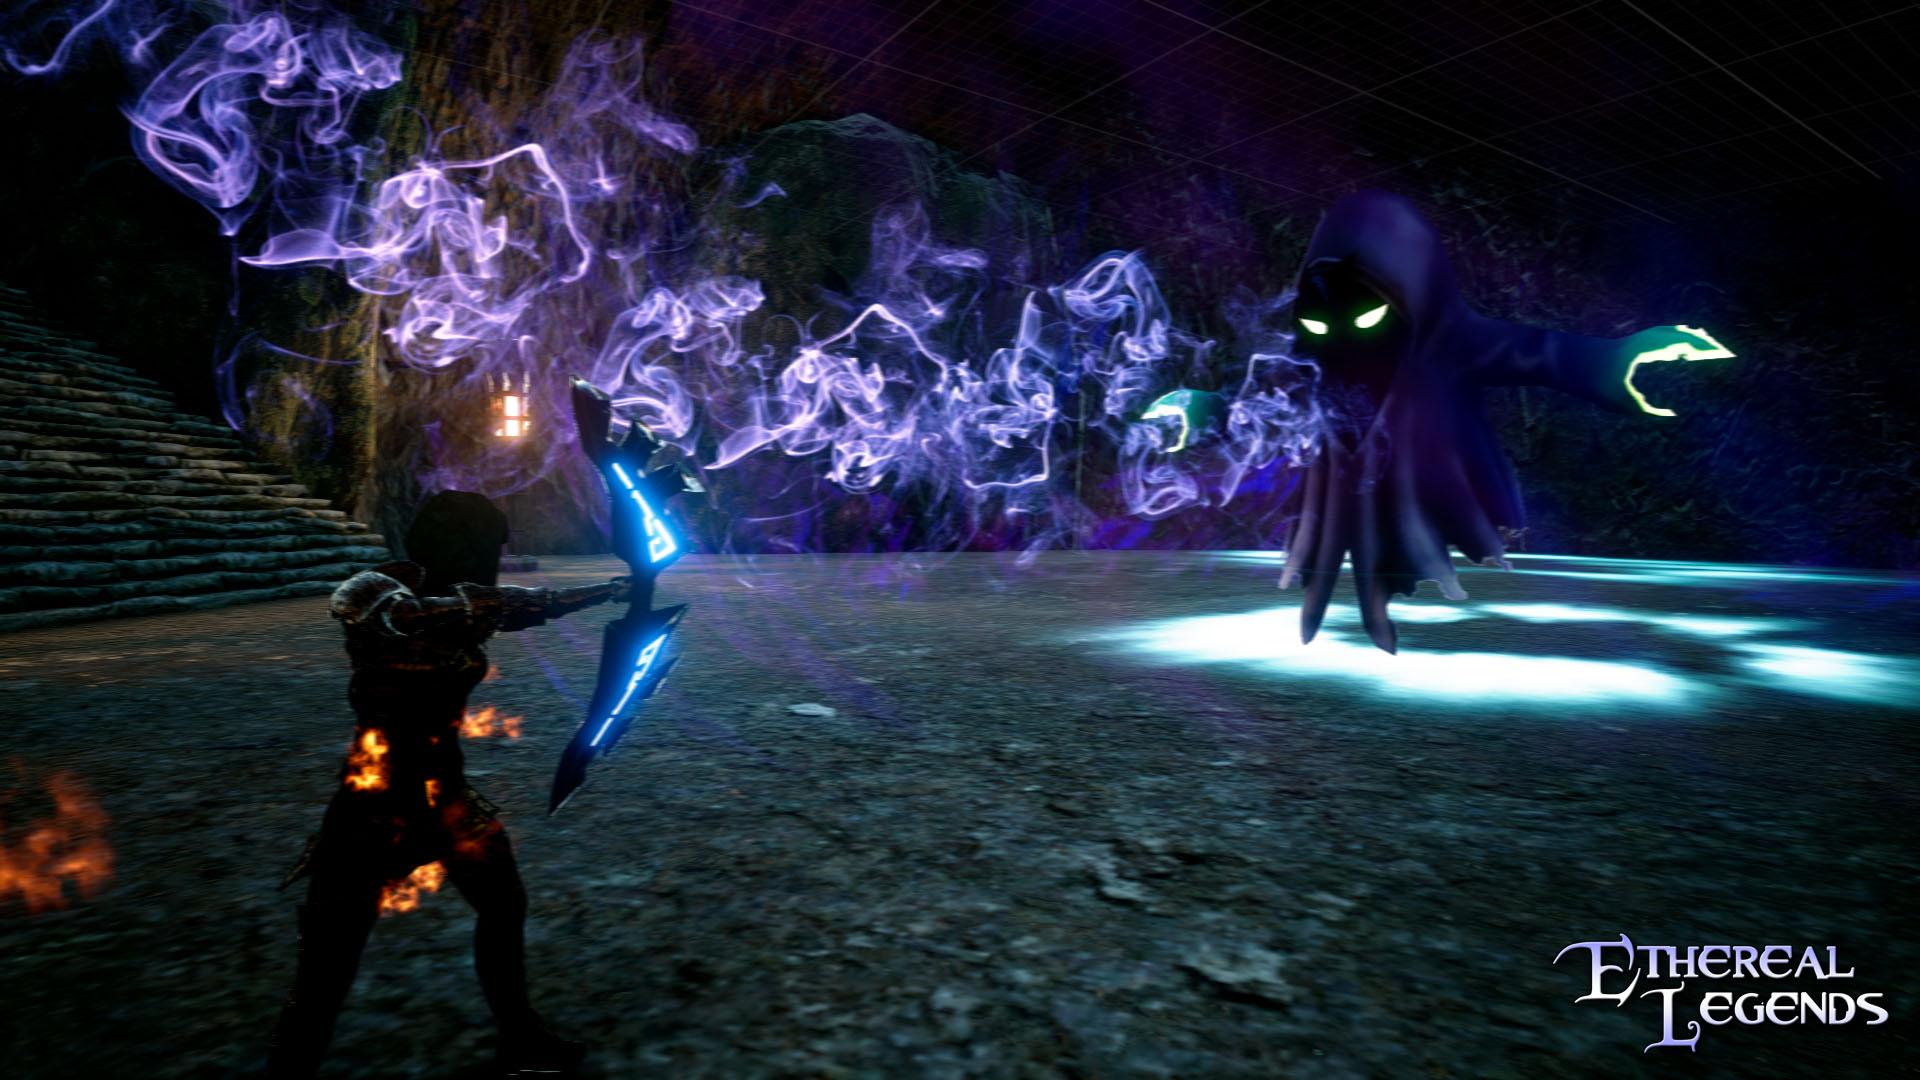 Ethereal Legends Screenshot 1